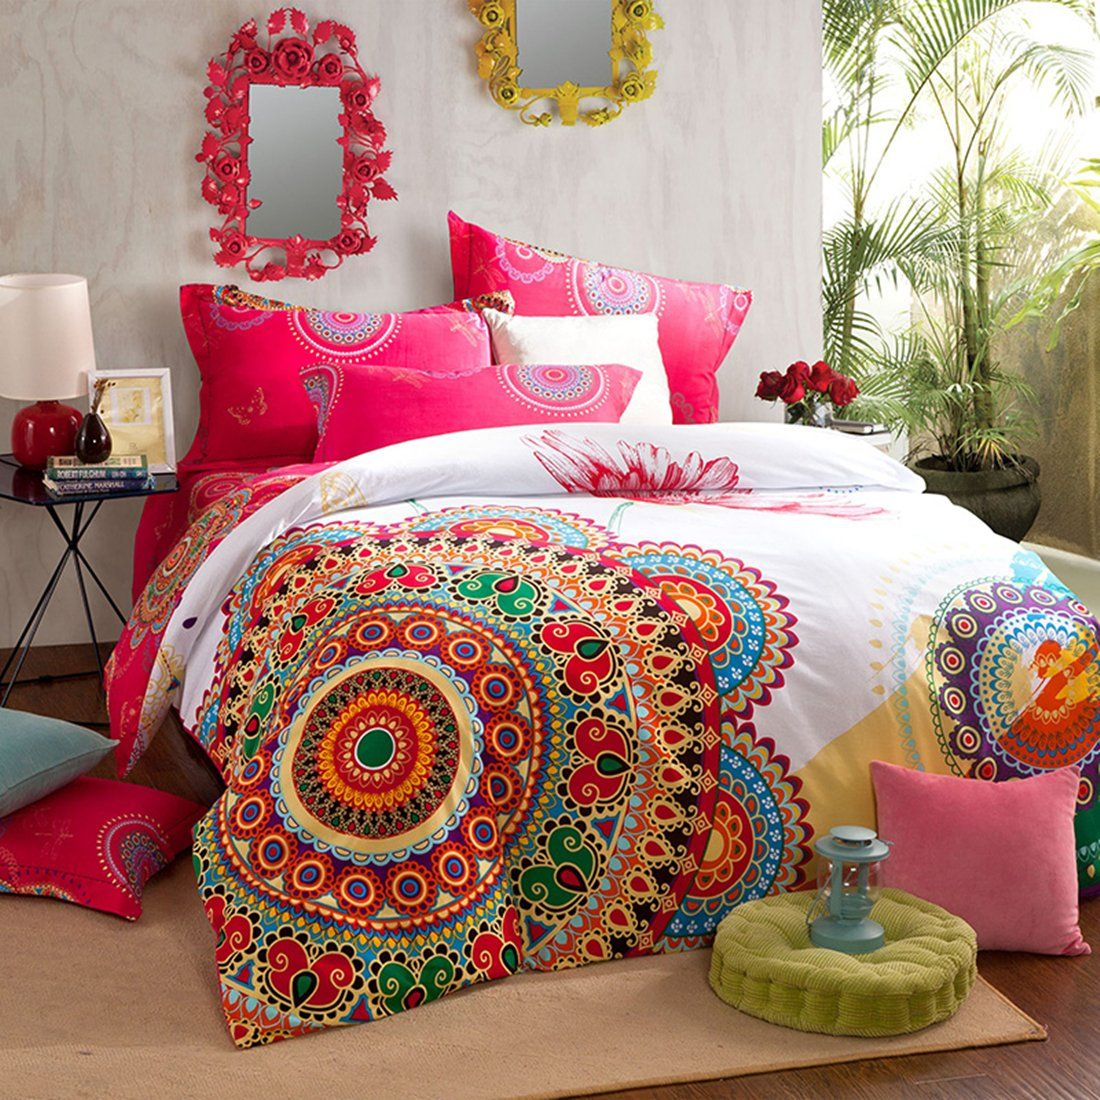 Amazon.com - MBIGM Home Textile, Boho Style Bedding Set, Boho Duvet Cover Set, Bohemian Bedding Set, 4Pcs, Comforter Not Included(King) -